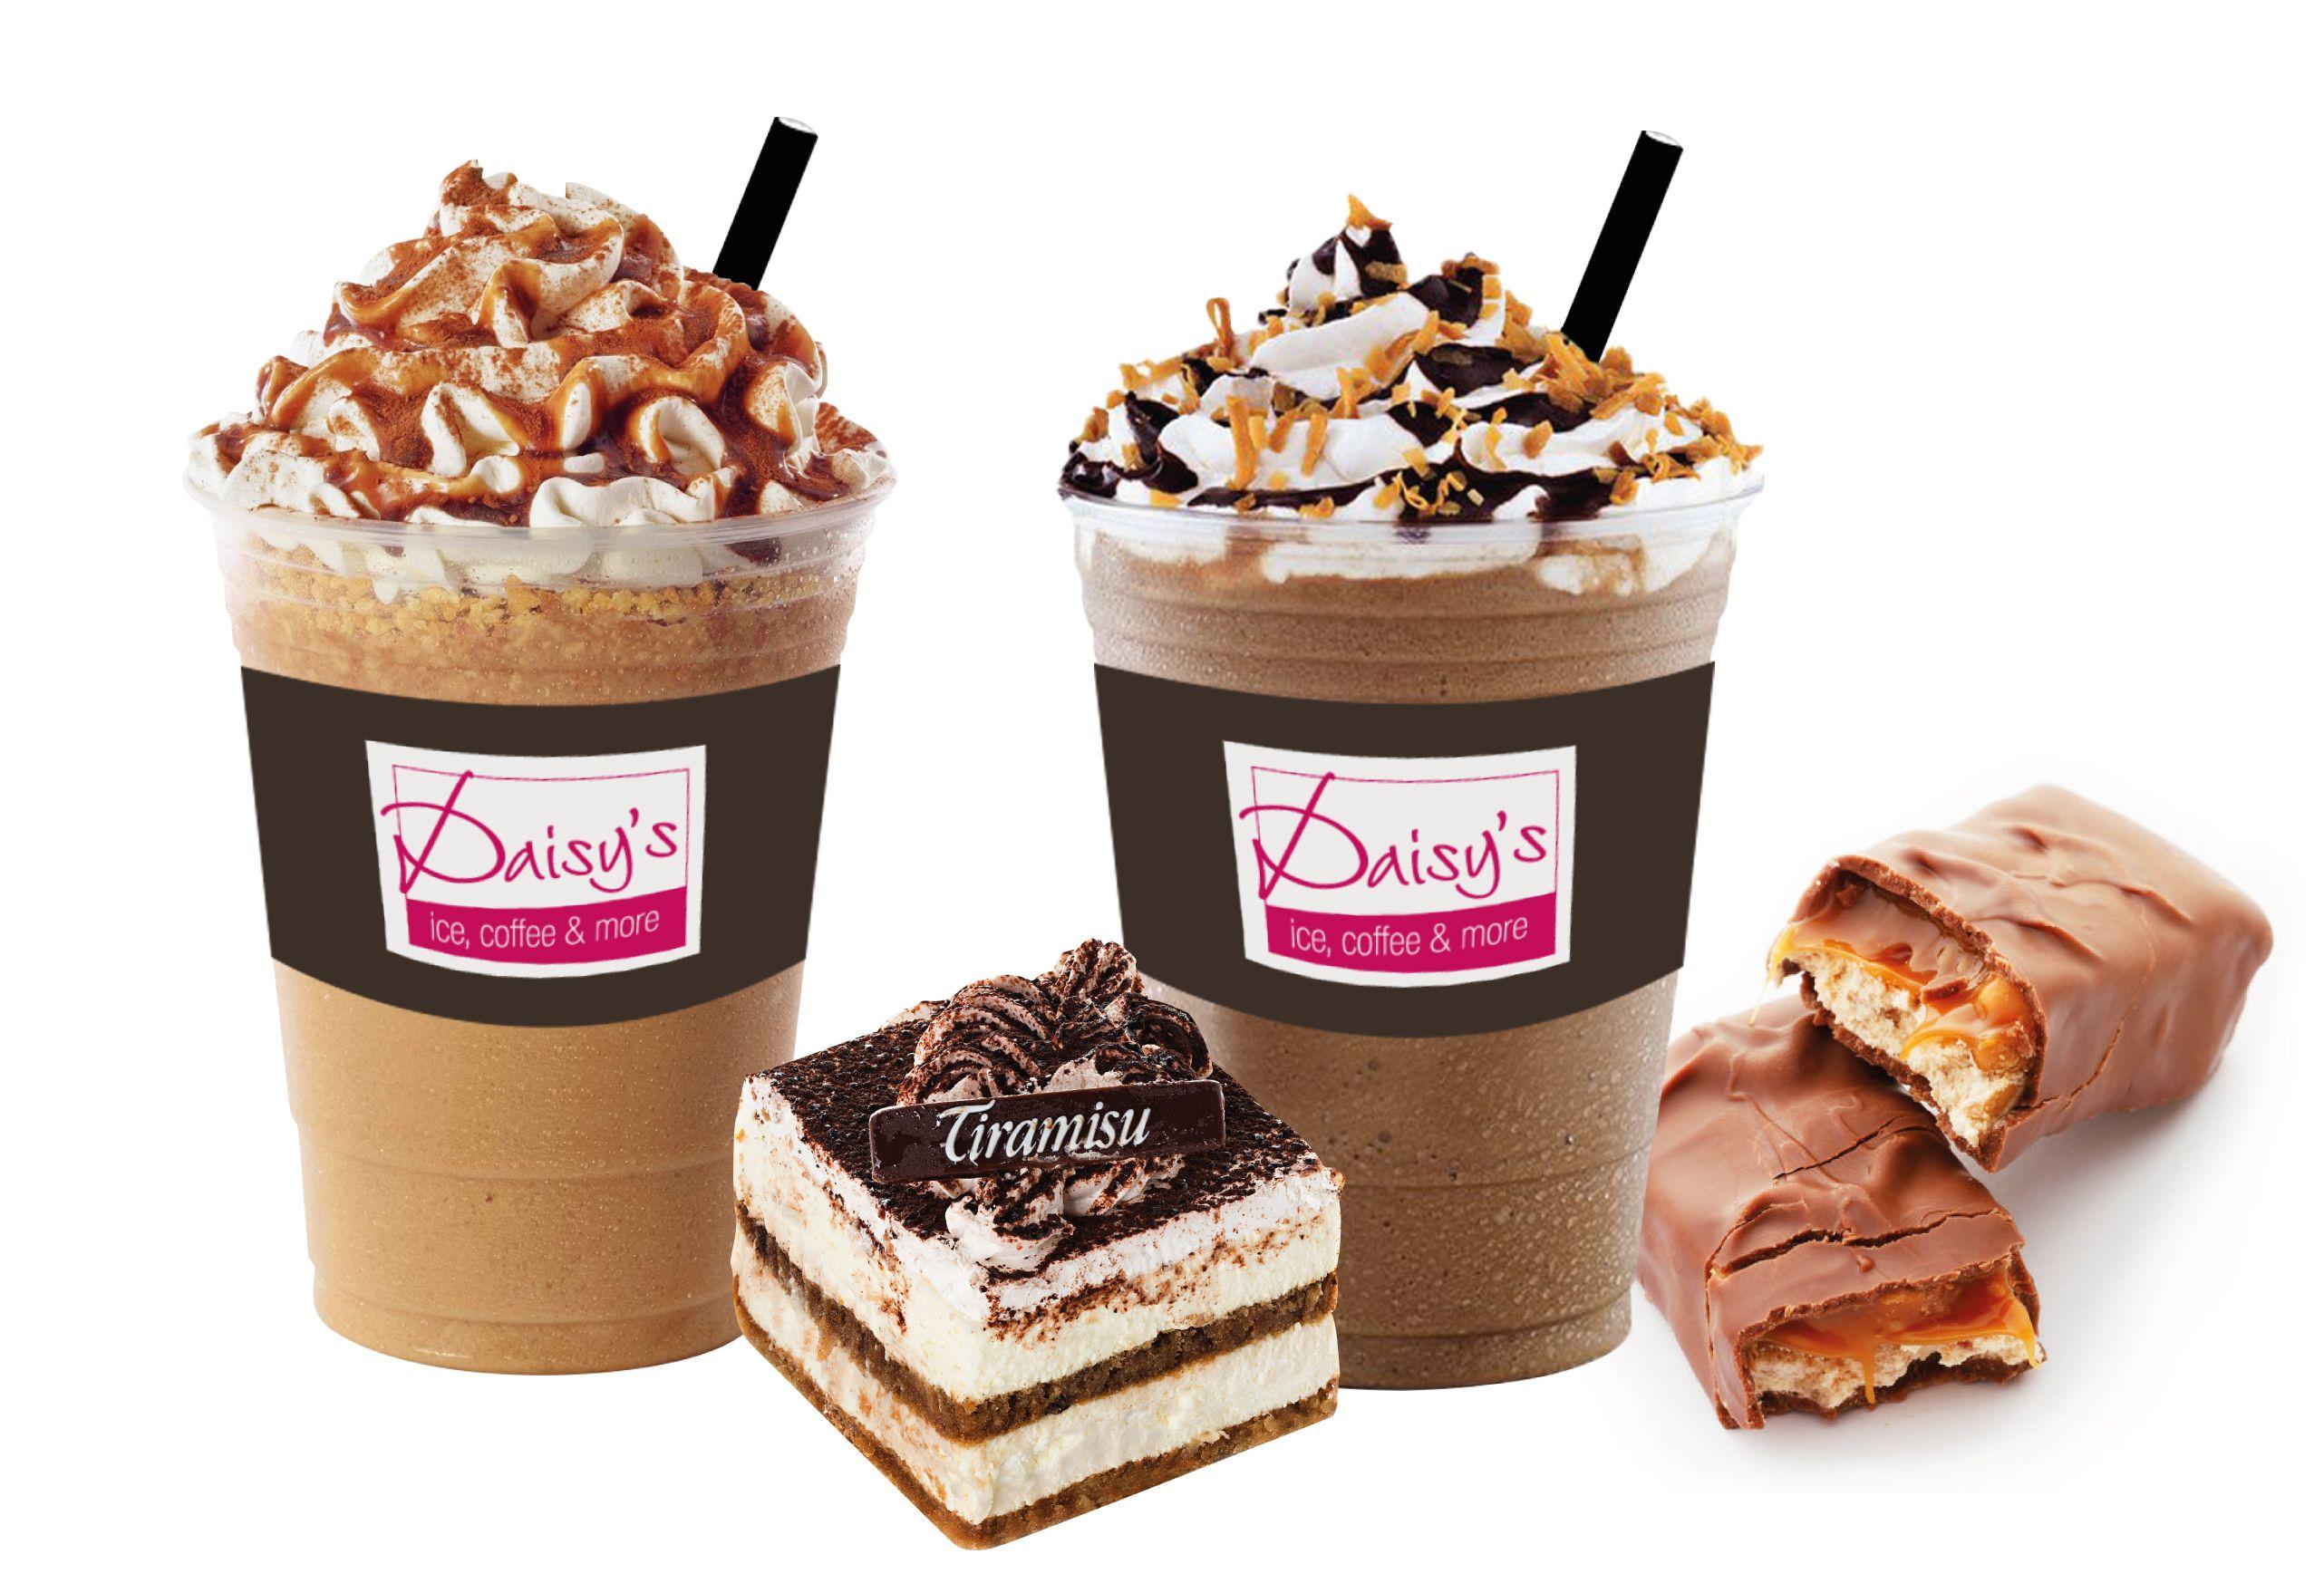 Overheerlijke milkshakes | Daisy's - Ice, coffee and more